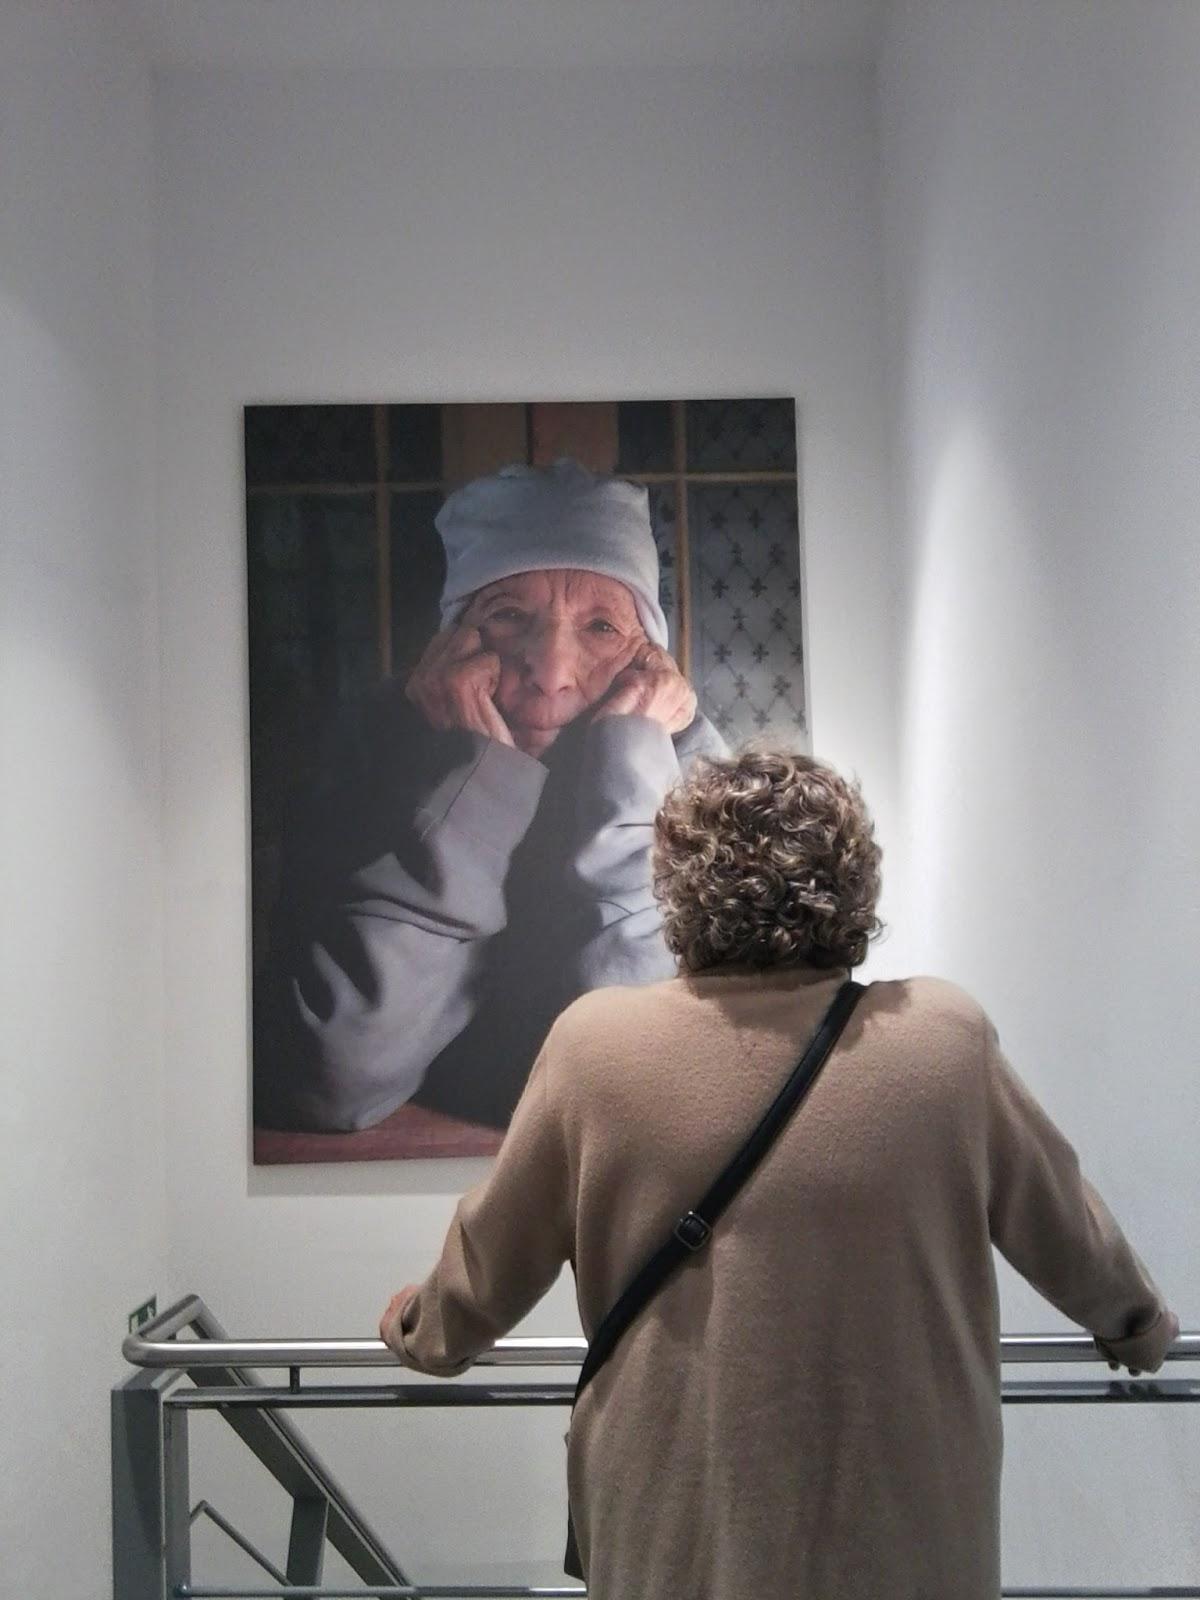 Arte, Arte contemporáneo, Exposiciones Madrid, Blog de Arte, Voa-Gallery, Yvonne Brochard, Louise Bourgeois, La Casa Encendida,